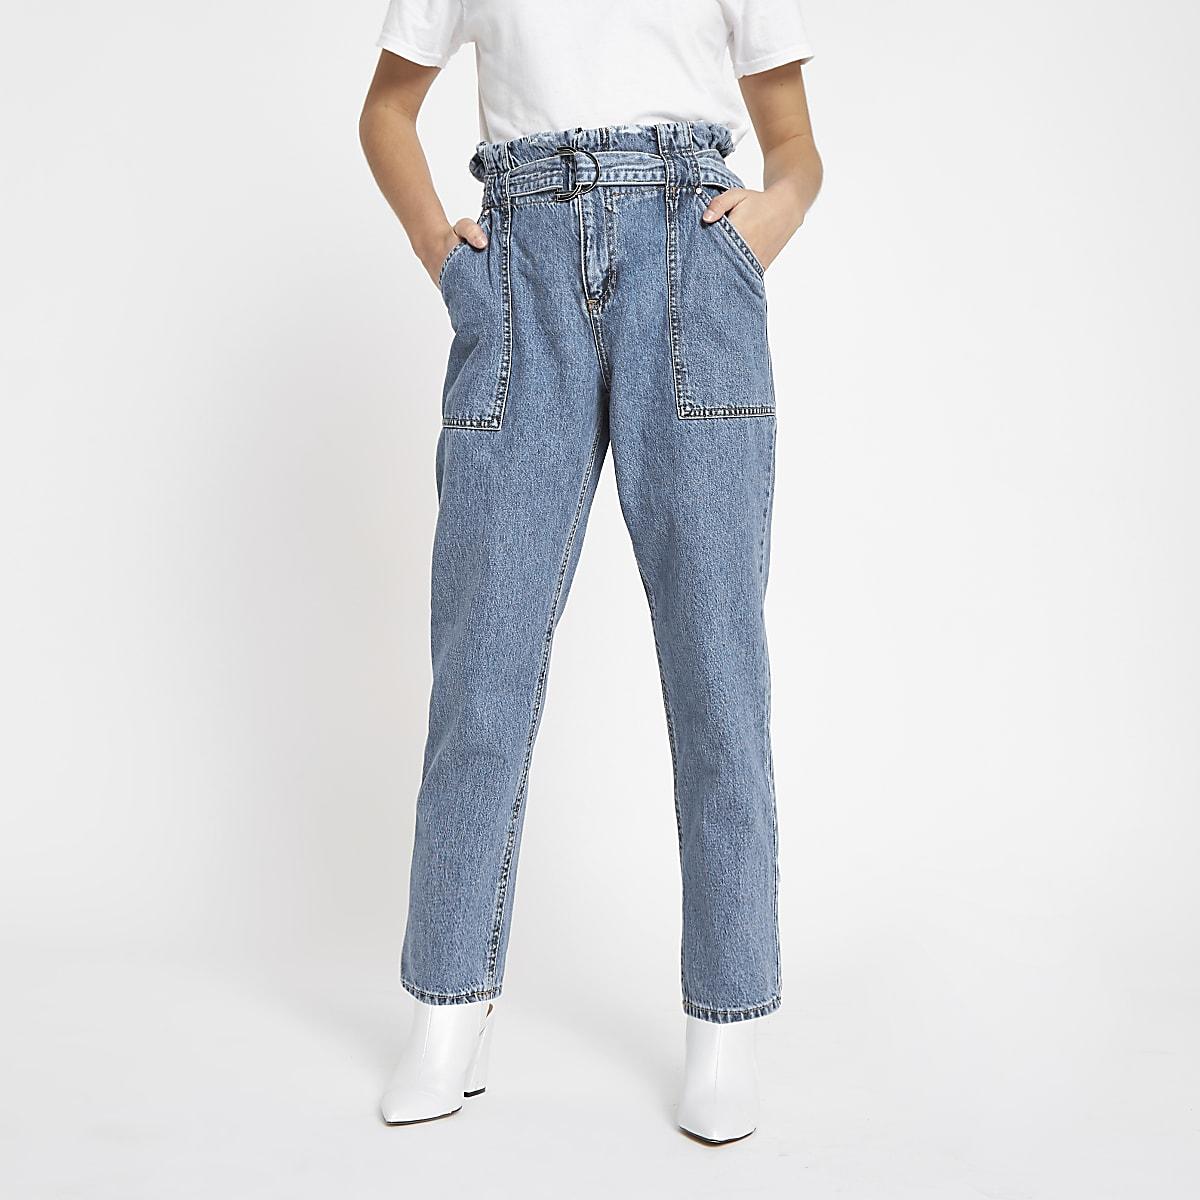 Petite blue paperbag denim jeans